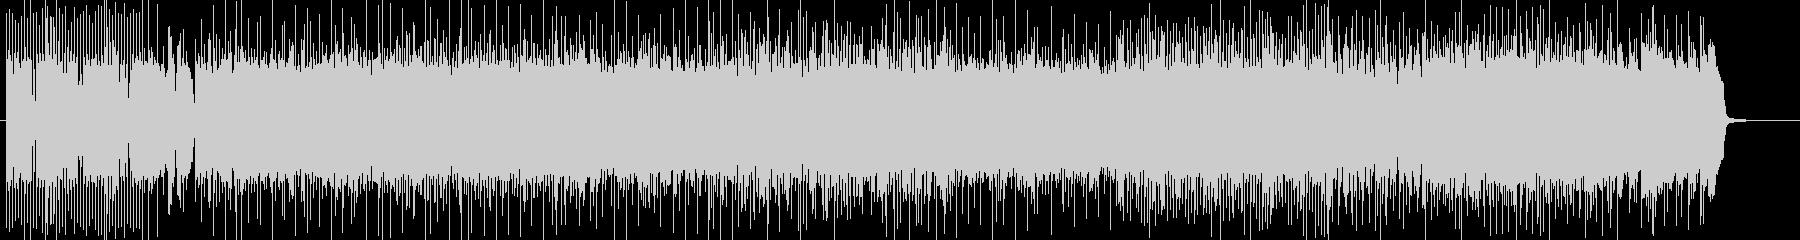 「HR/HM」「DARK」BGM144の未再生の波形